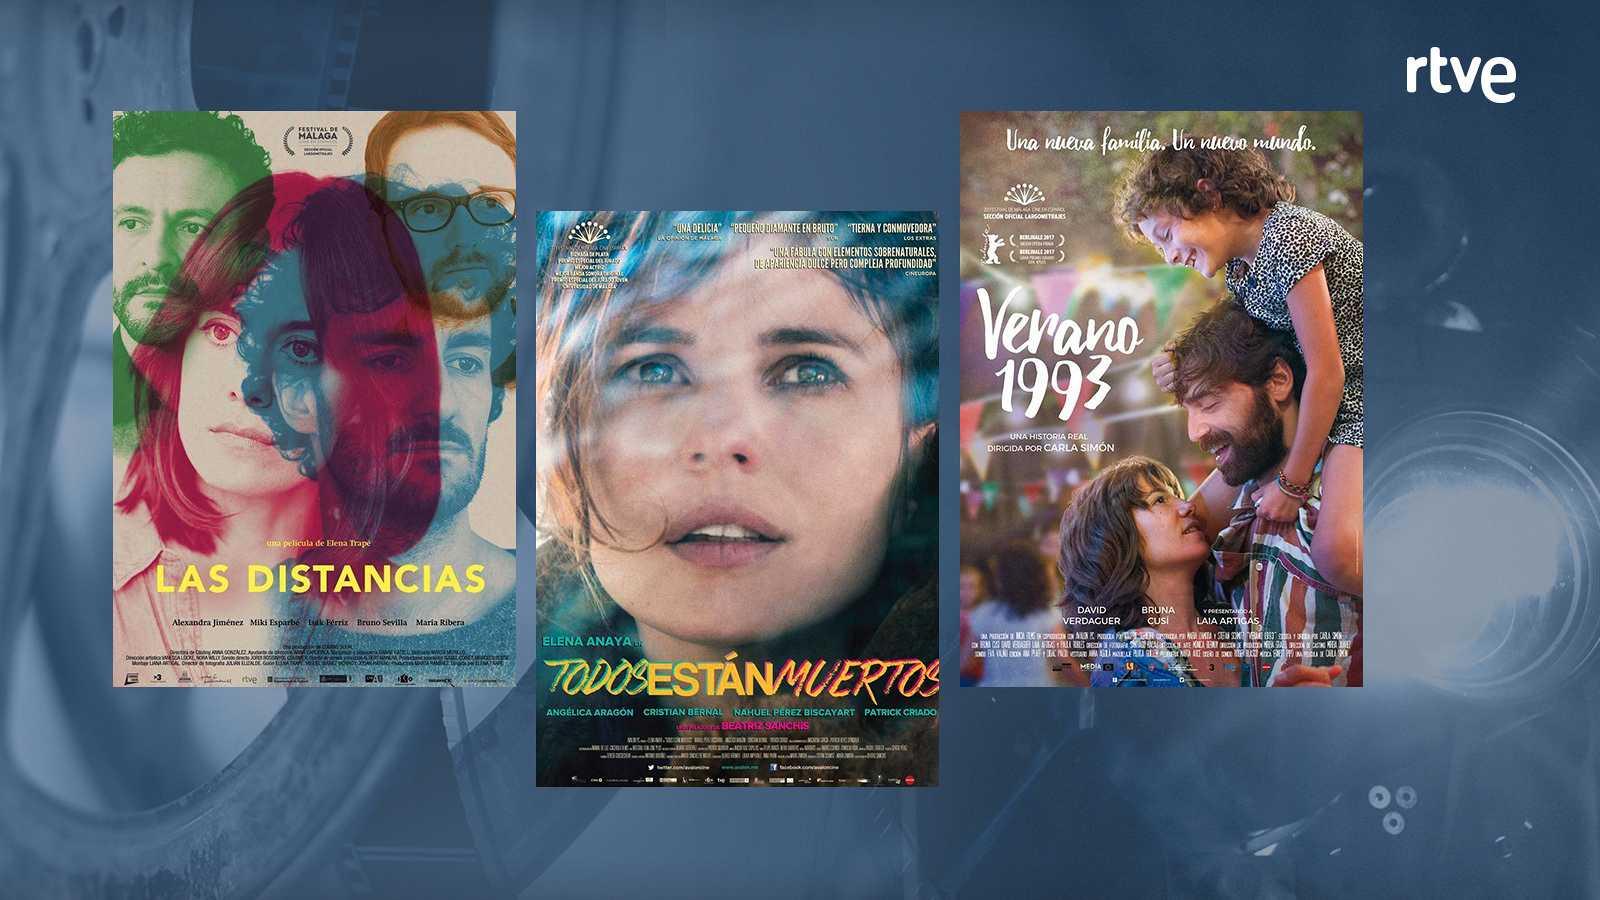 Rtve Te Ofrece Gratis Las Películas Premiadas L Rtve